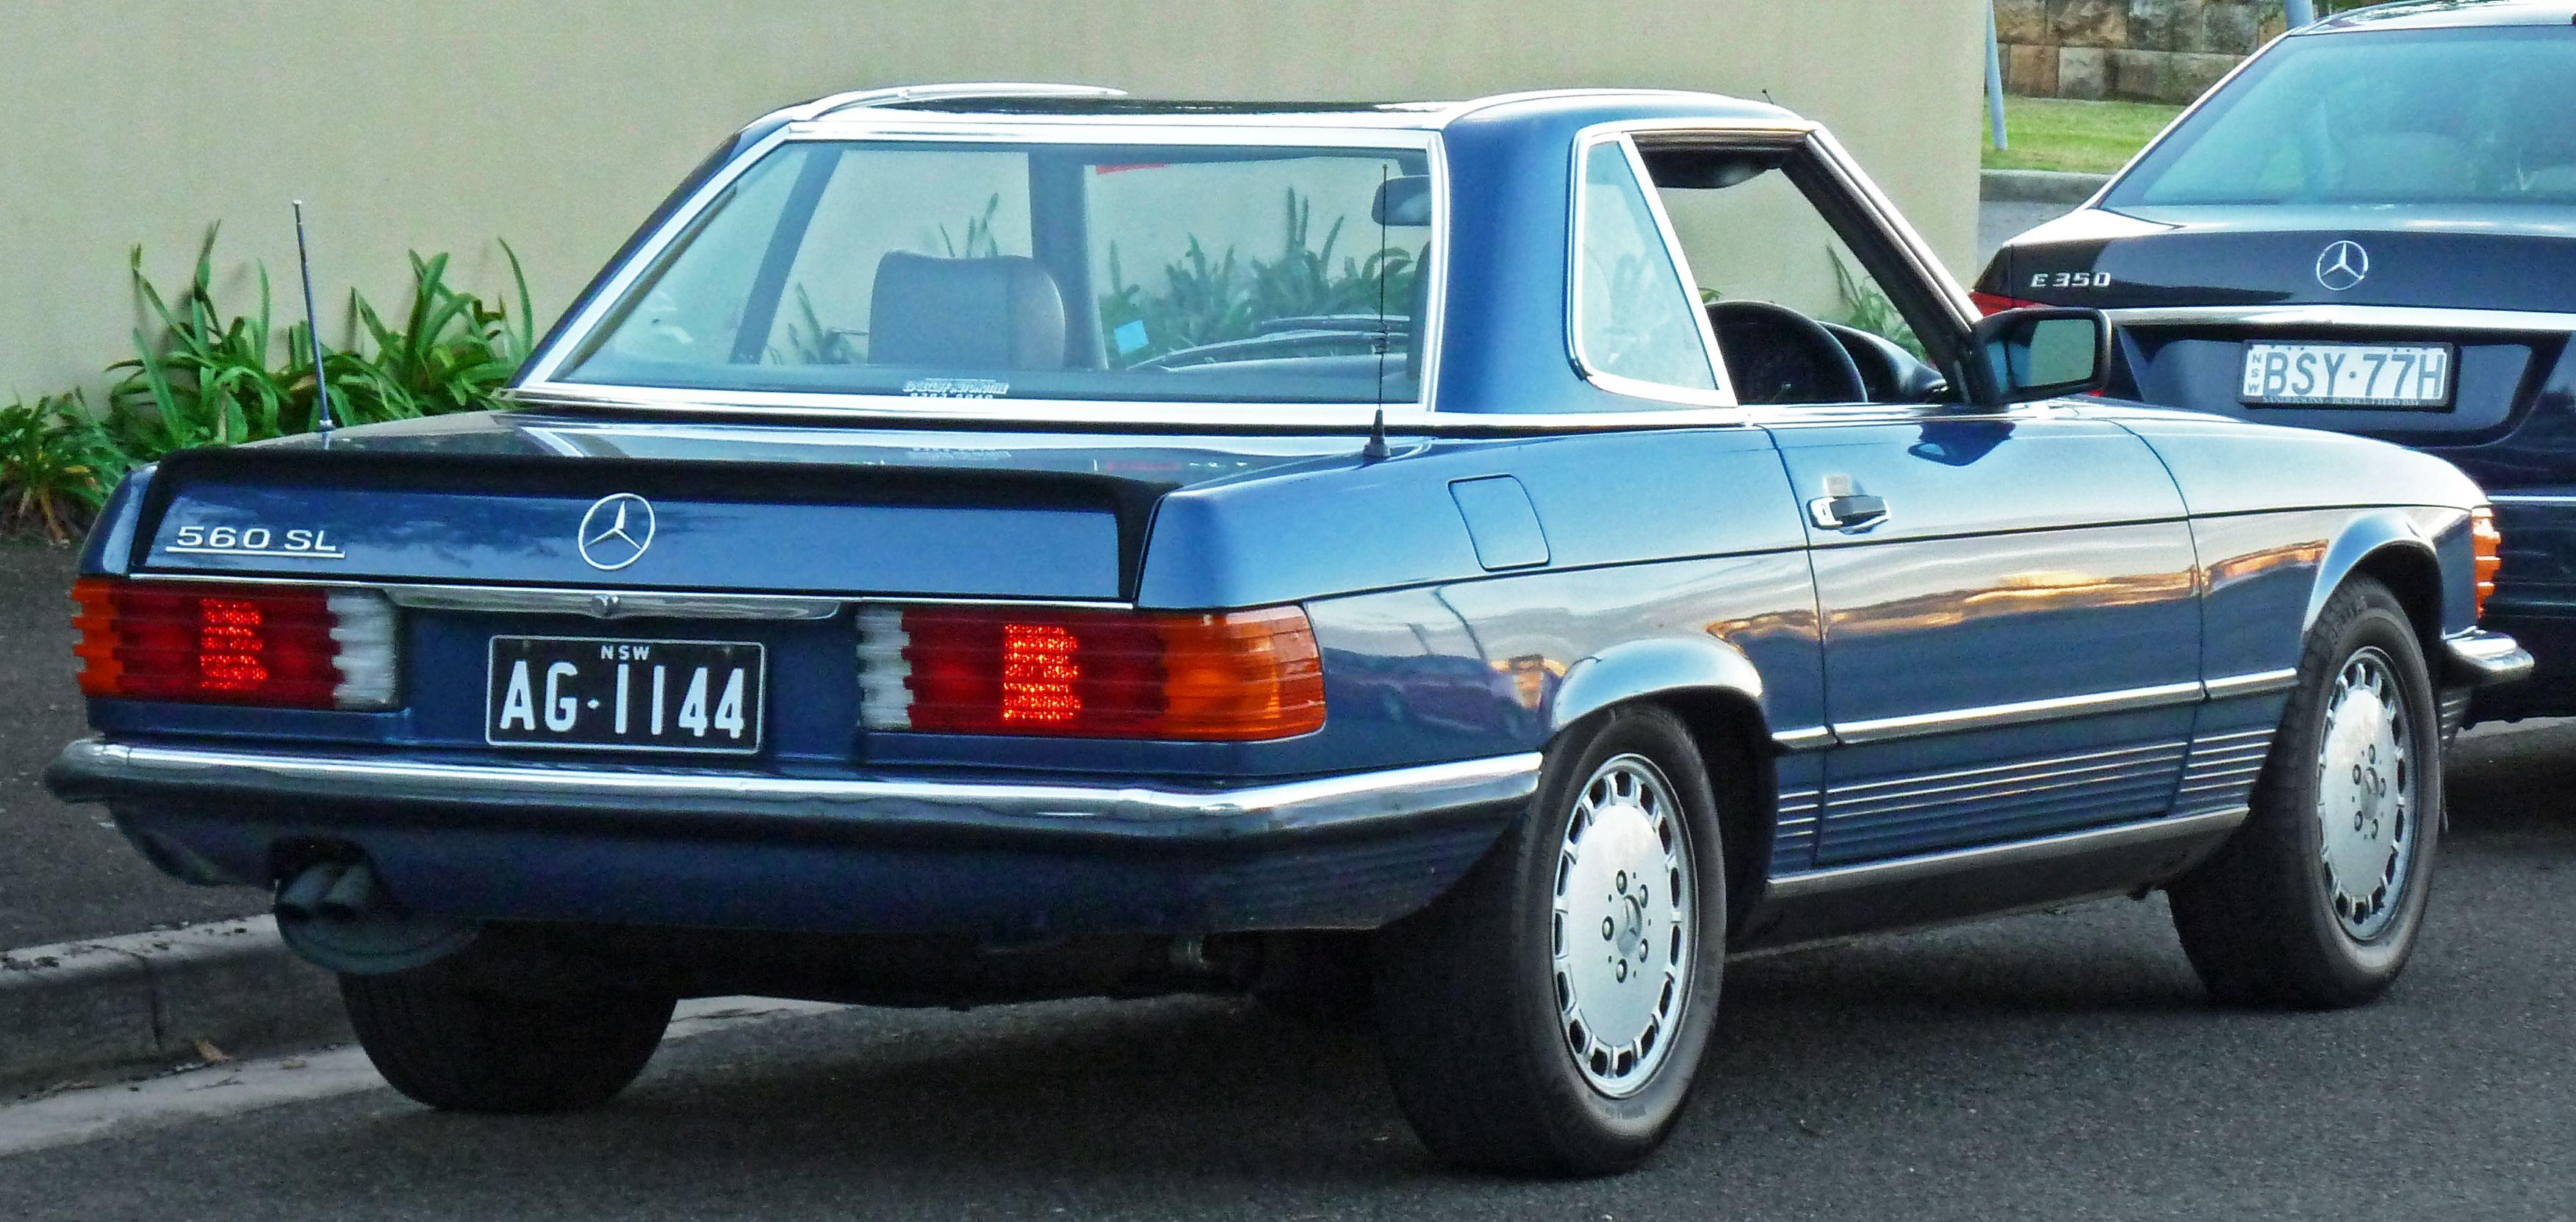 1987 mercedes benz 560 sl roadster australia mercedes for Mercedes benz 1987